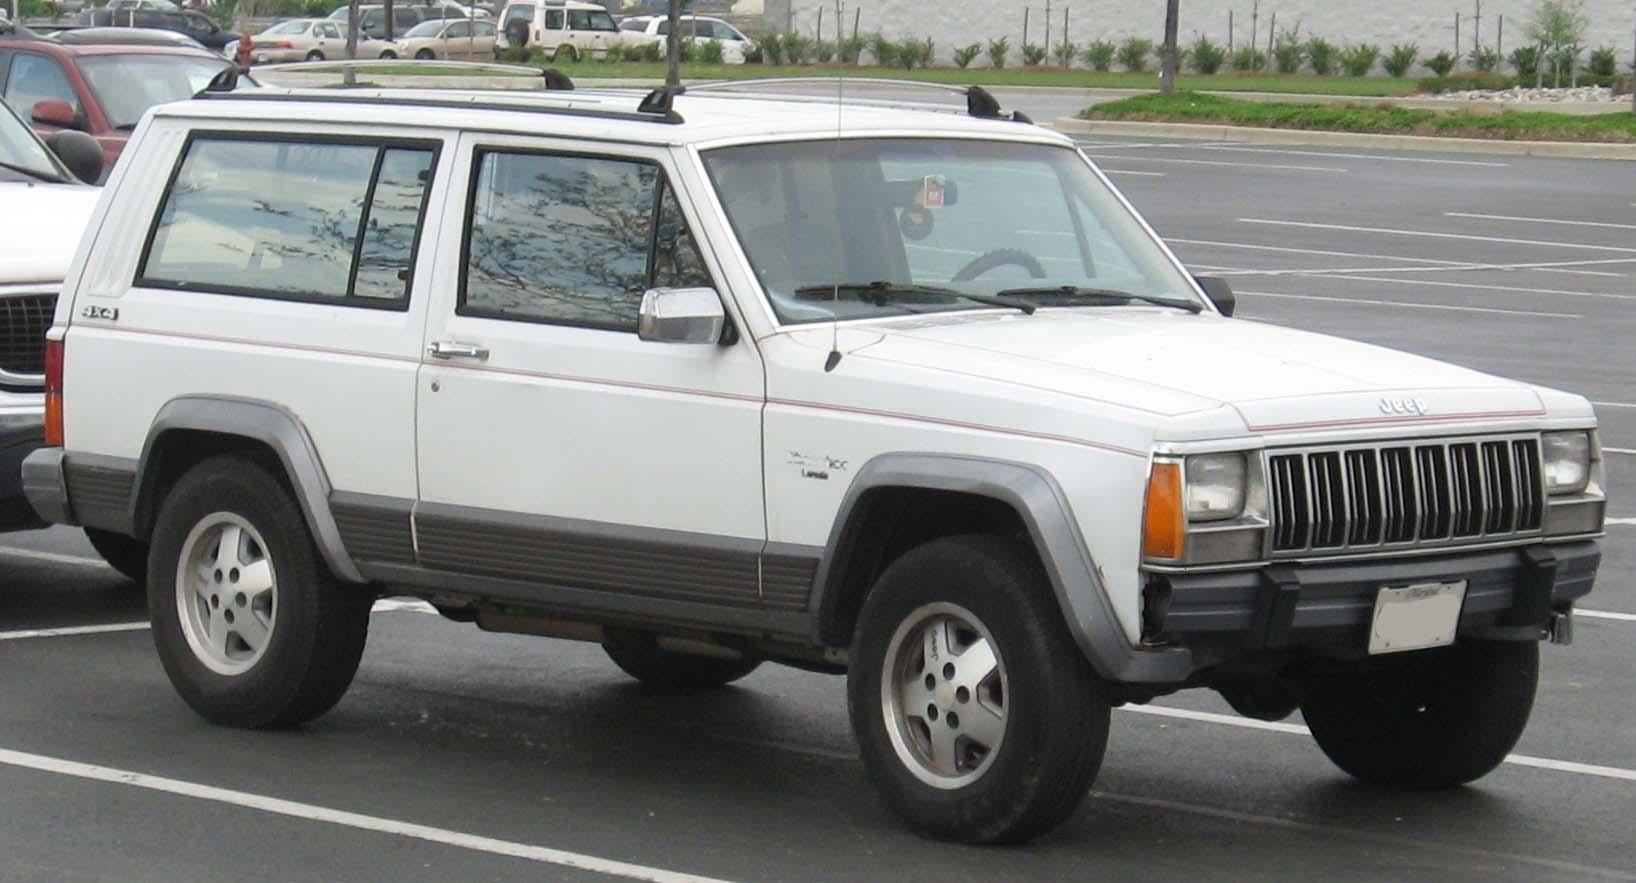 2007 Jeep Grand Cherokee Laredo >> File:84-96 Jeep Cherokee 2door.jpg - Wikipedia